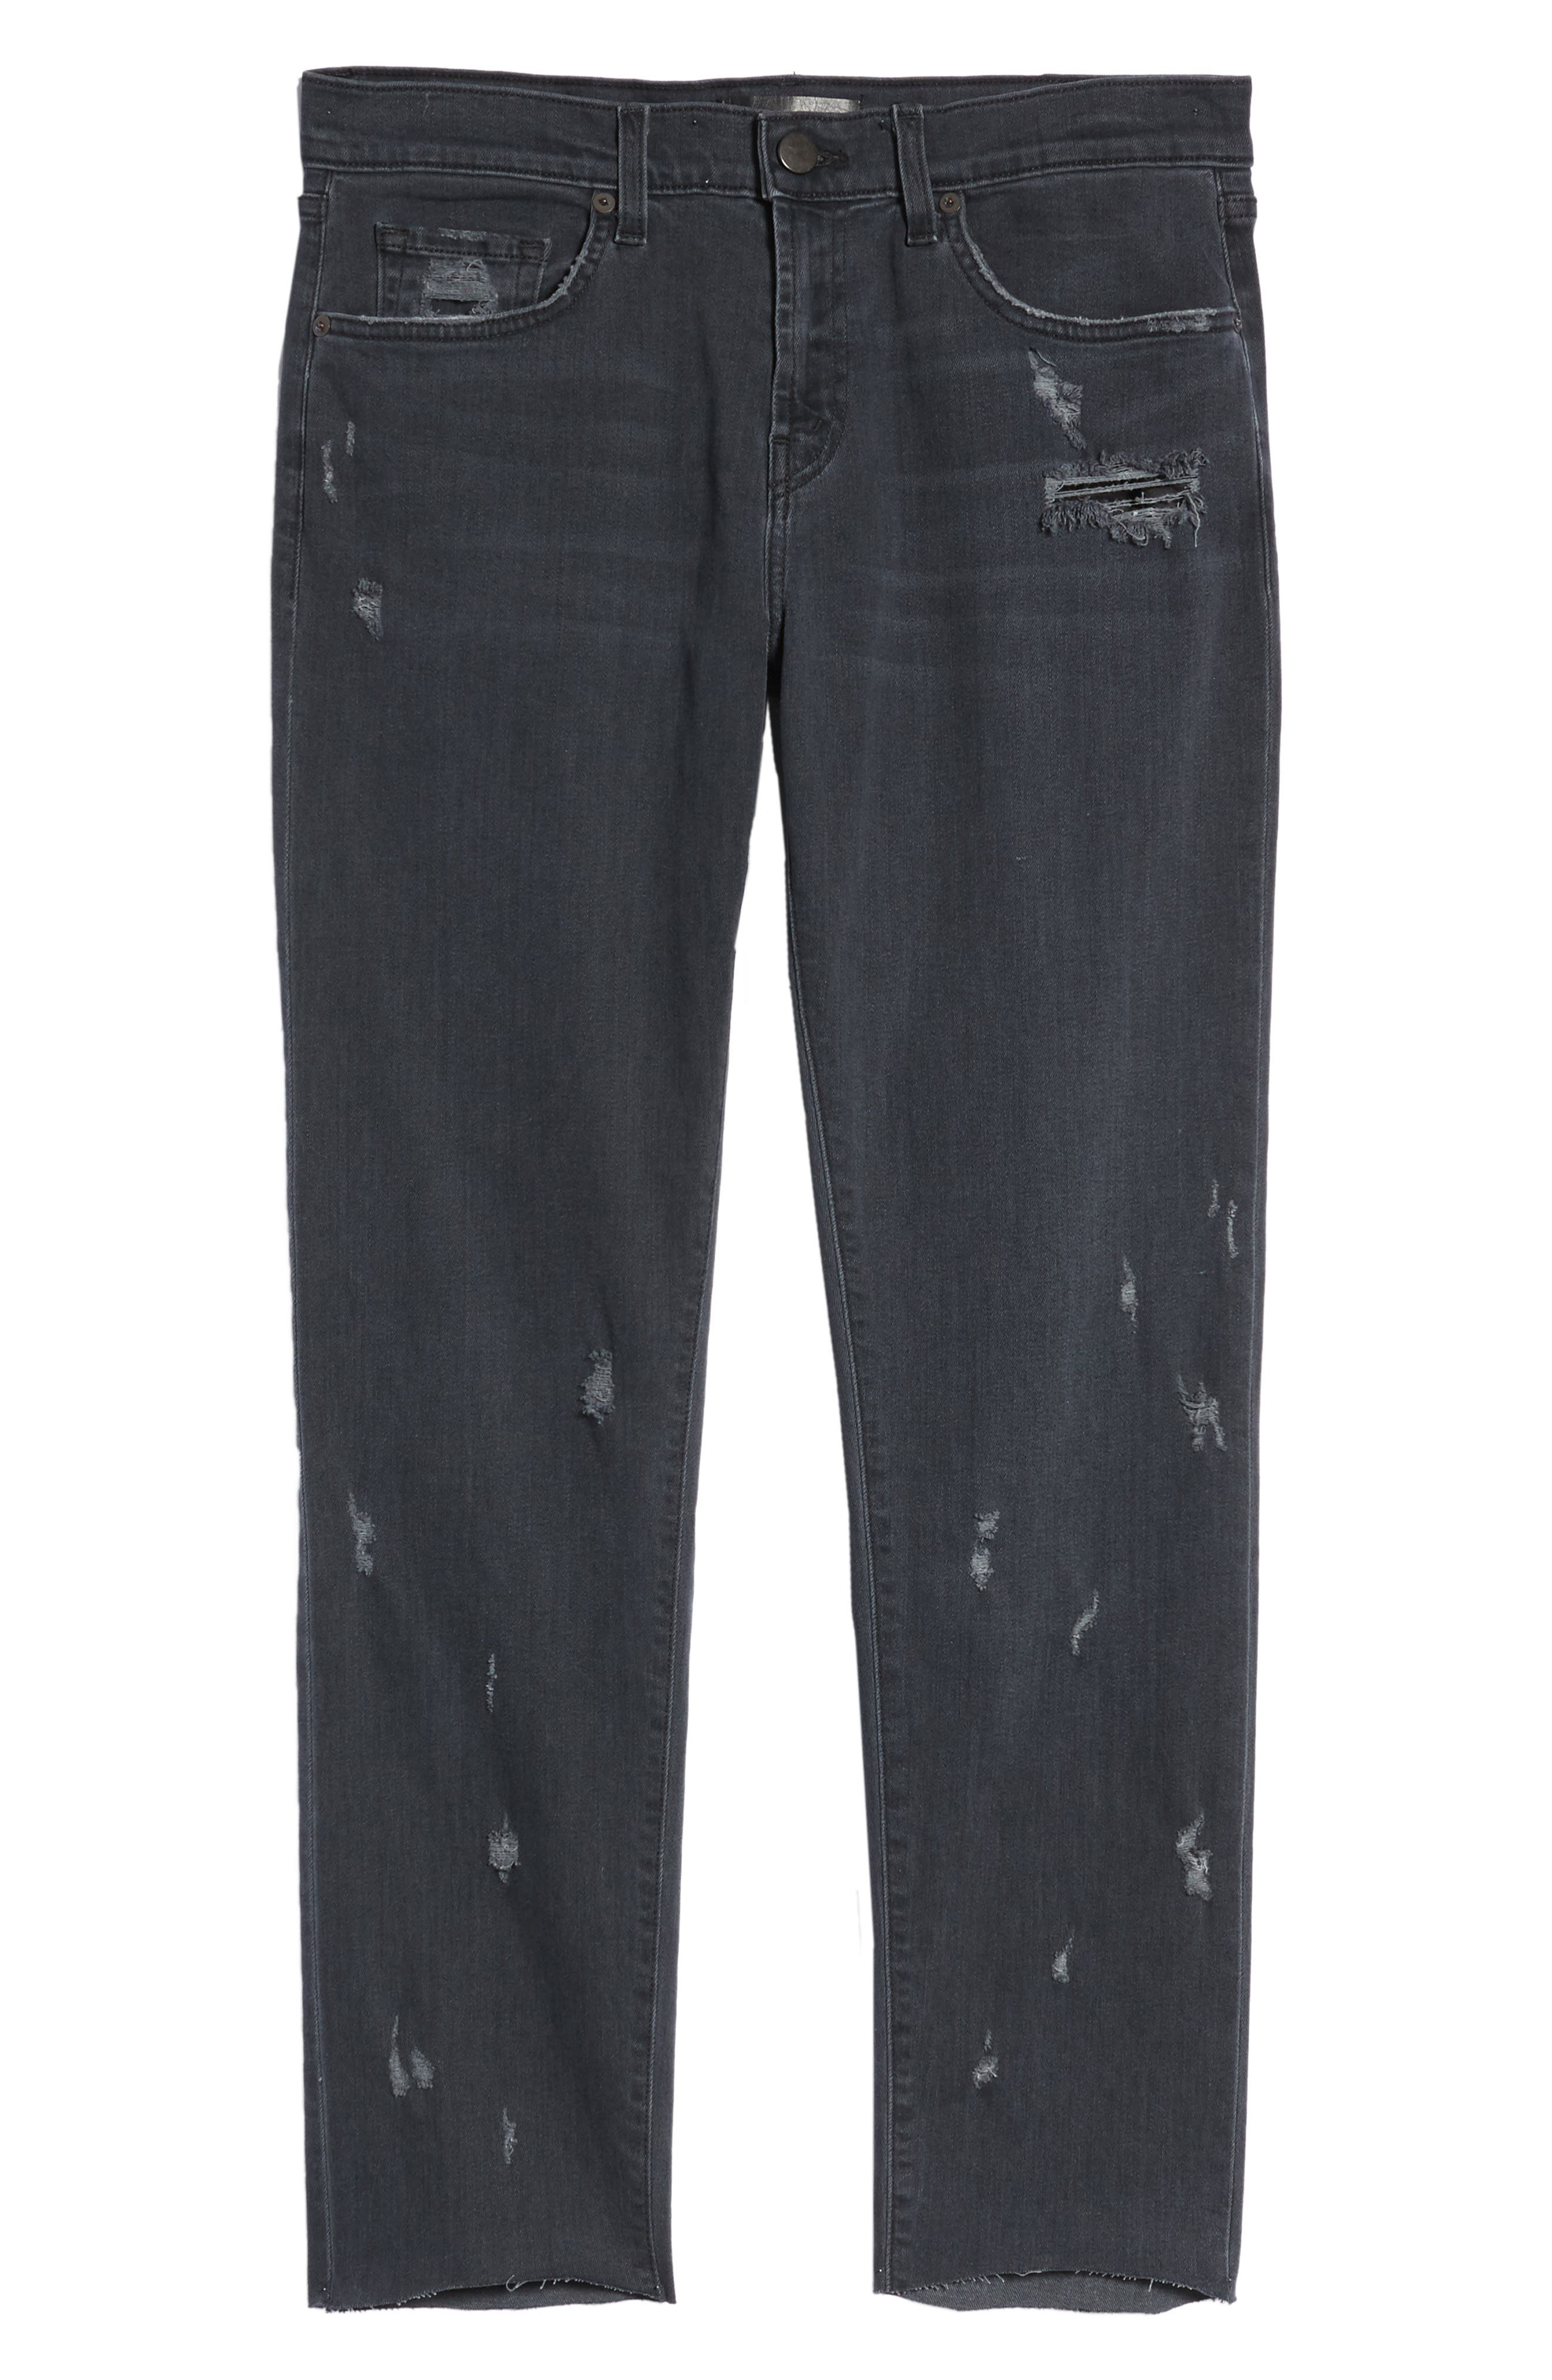 Tyler Slim Fit Jeans,                             Alternate thumbnail 6, color,                             001